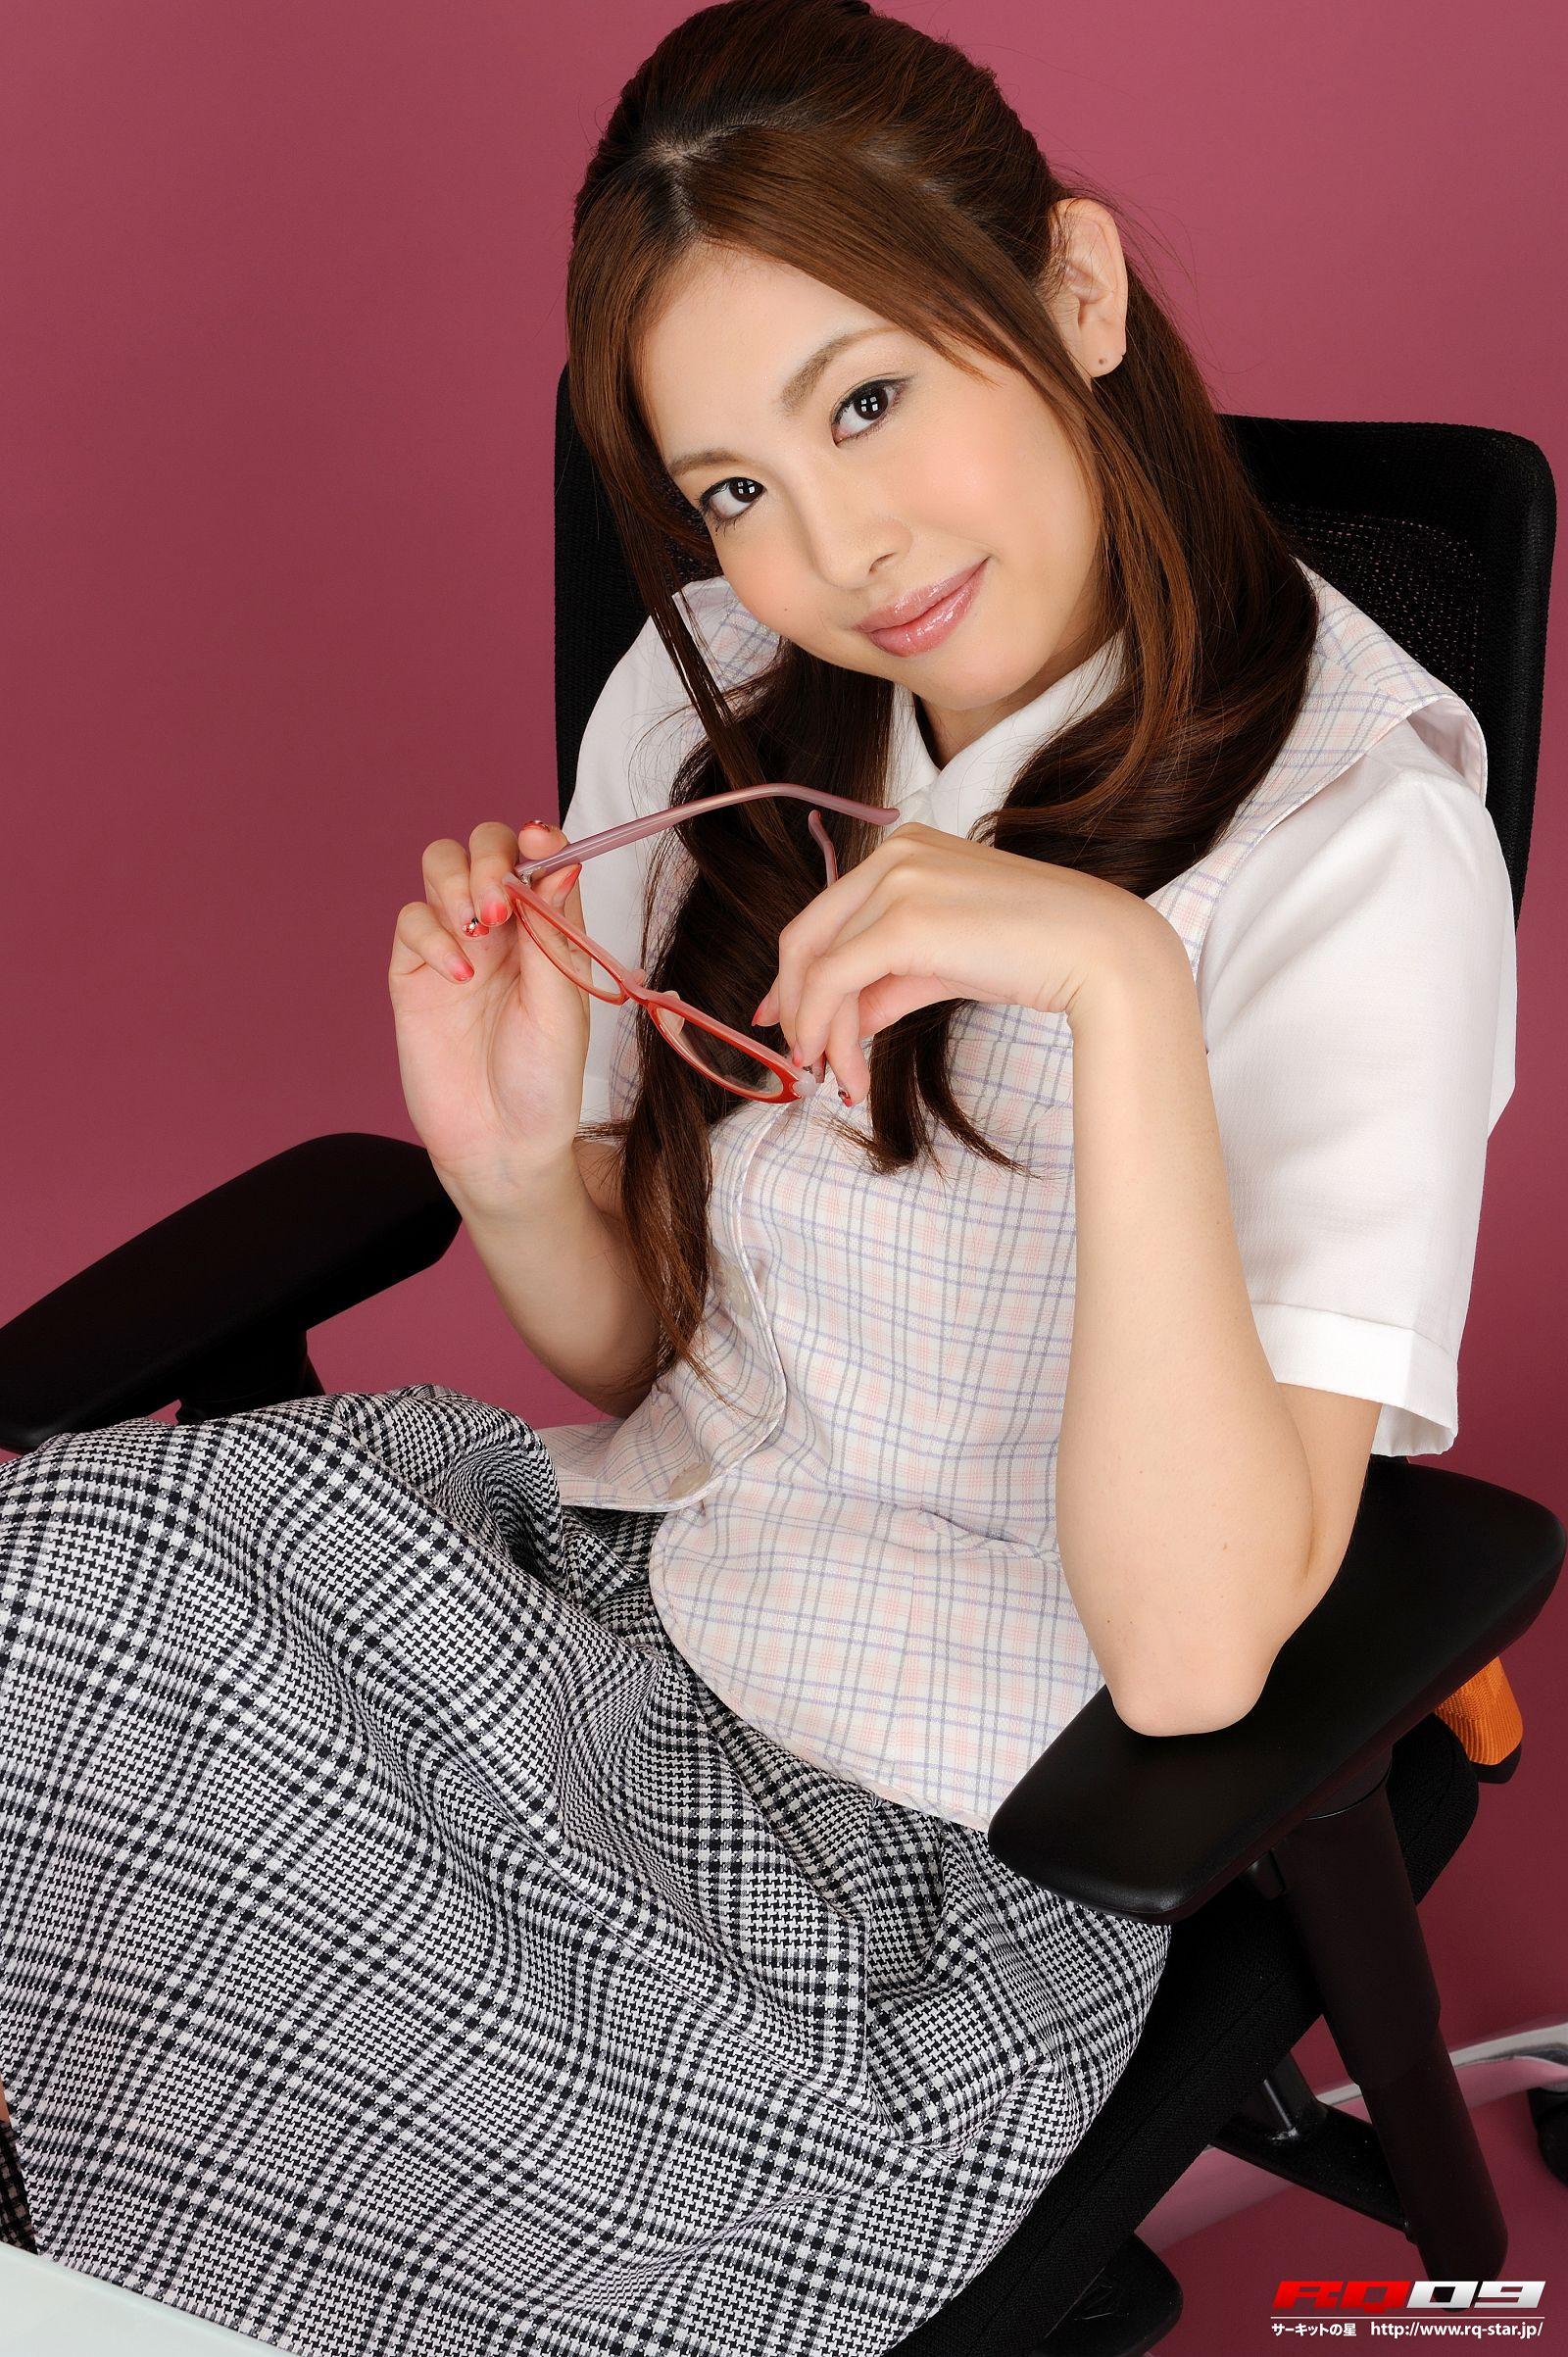 [RQ STAR美女] NO.0160 Sayuri Kouda 幸田さゆり Office Lady[130P] RQ STAR 第3张